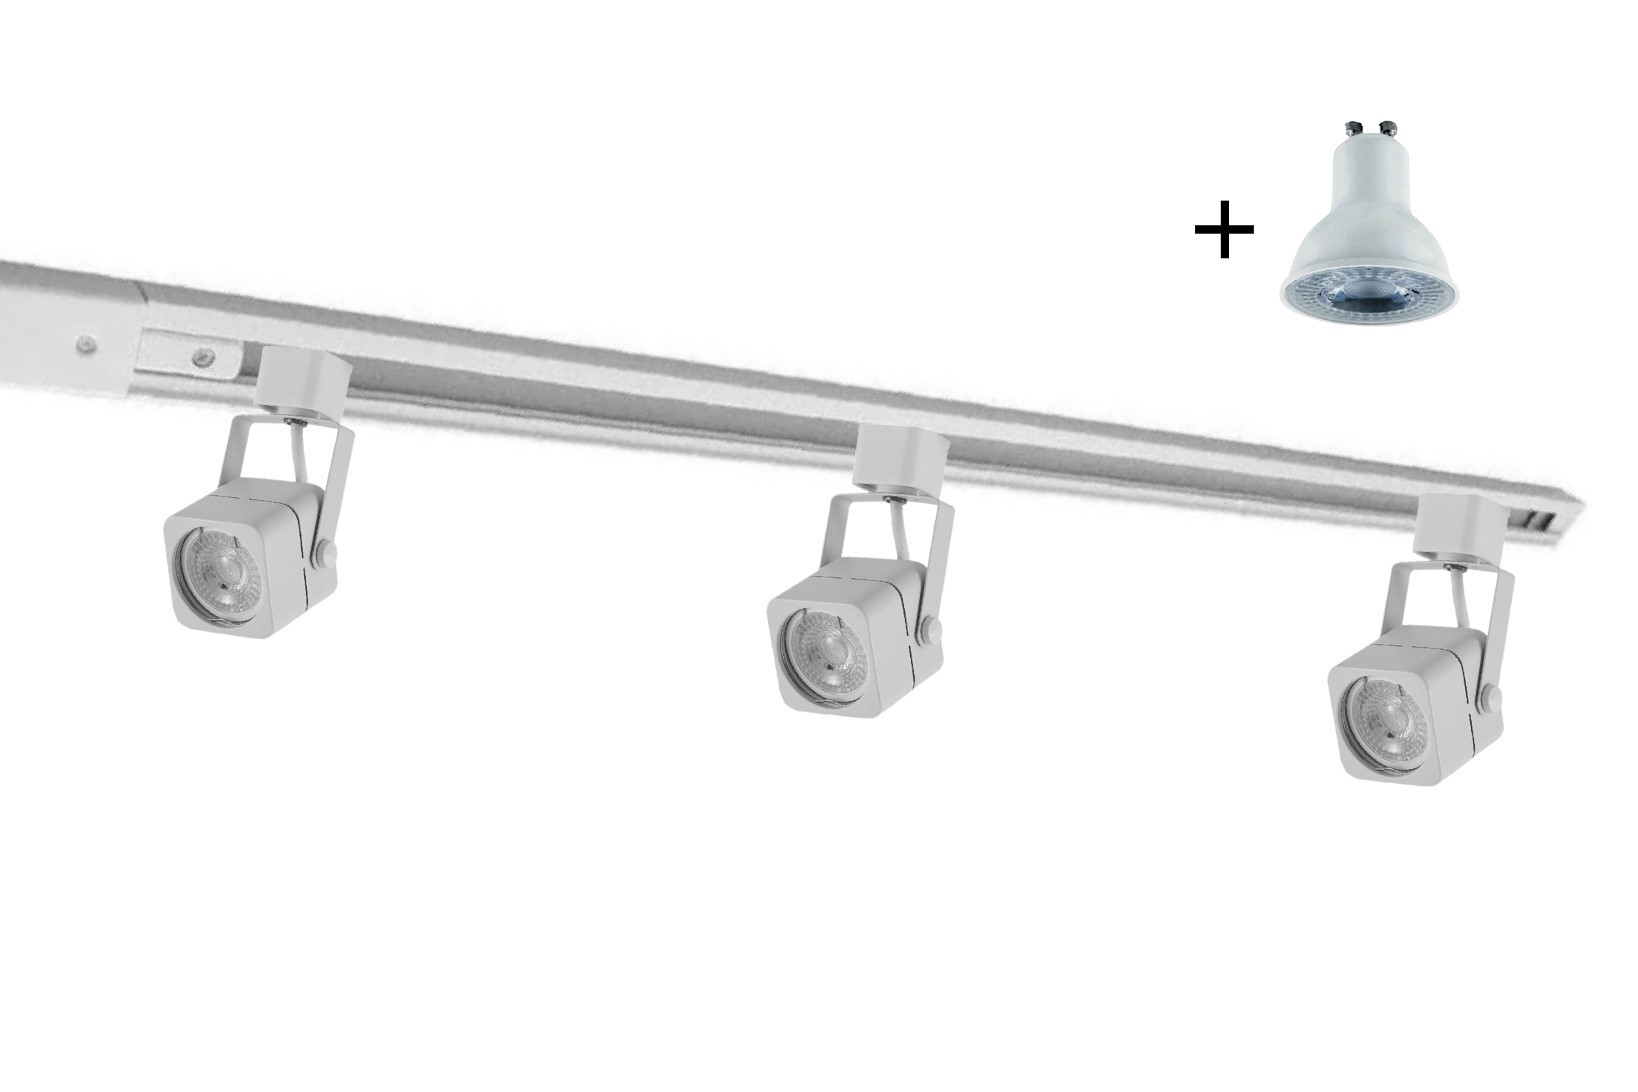 Kit Trilho Eletrificado 1m Branco Nordecor + 3 Spot Quad MR16 / GU10 + Lâmp. Led Luz Quente